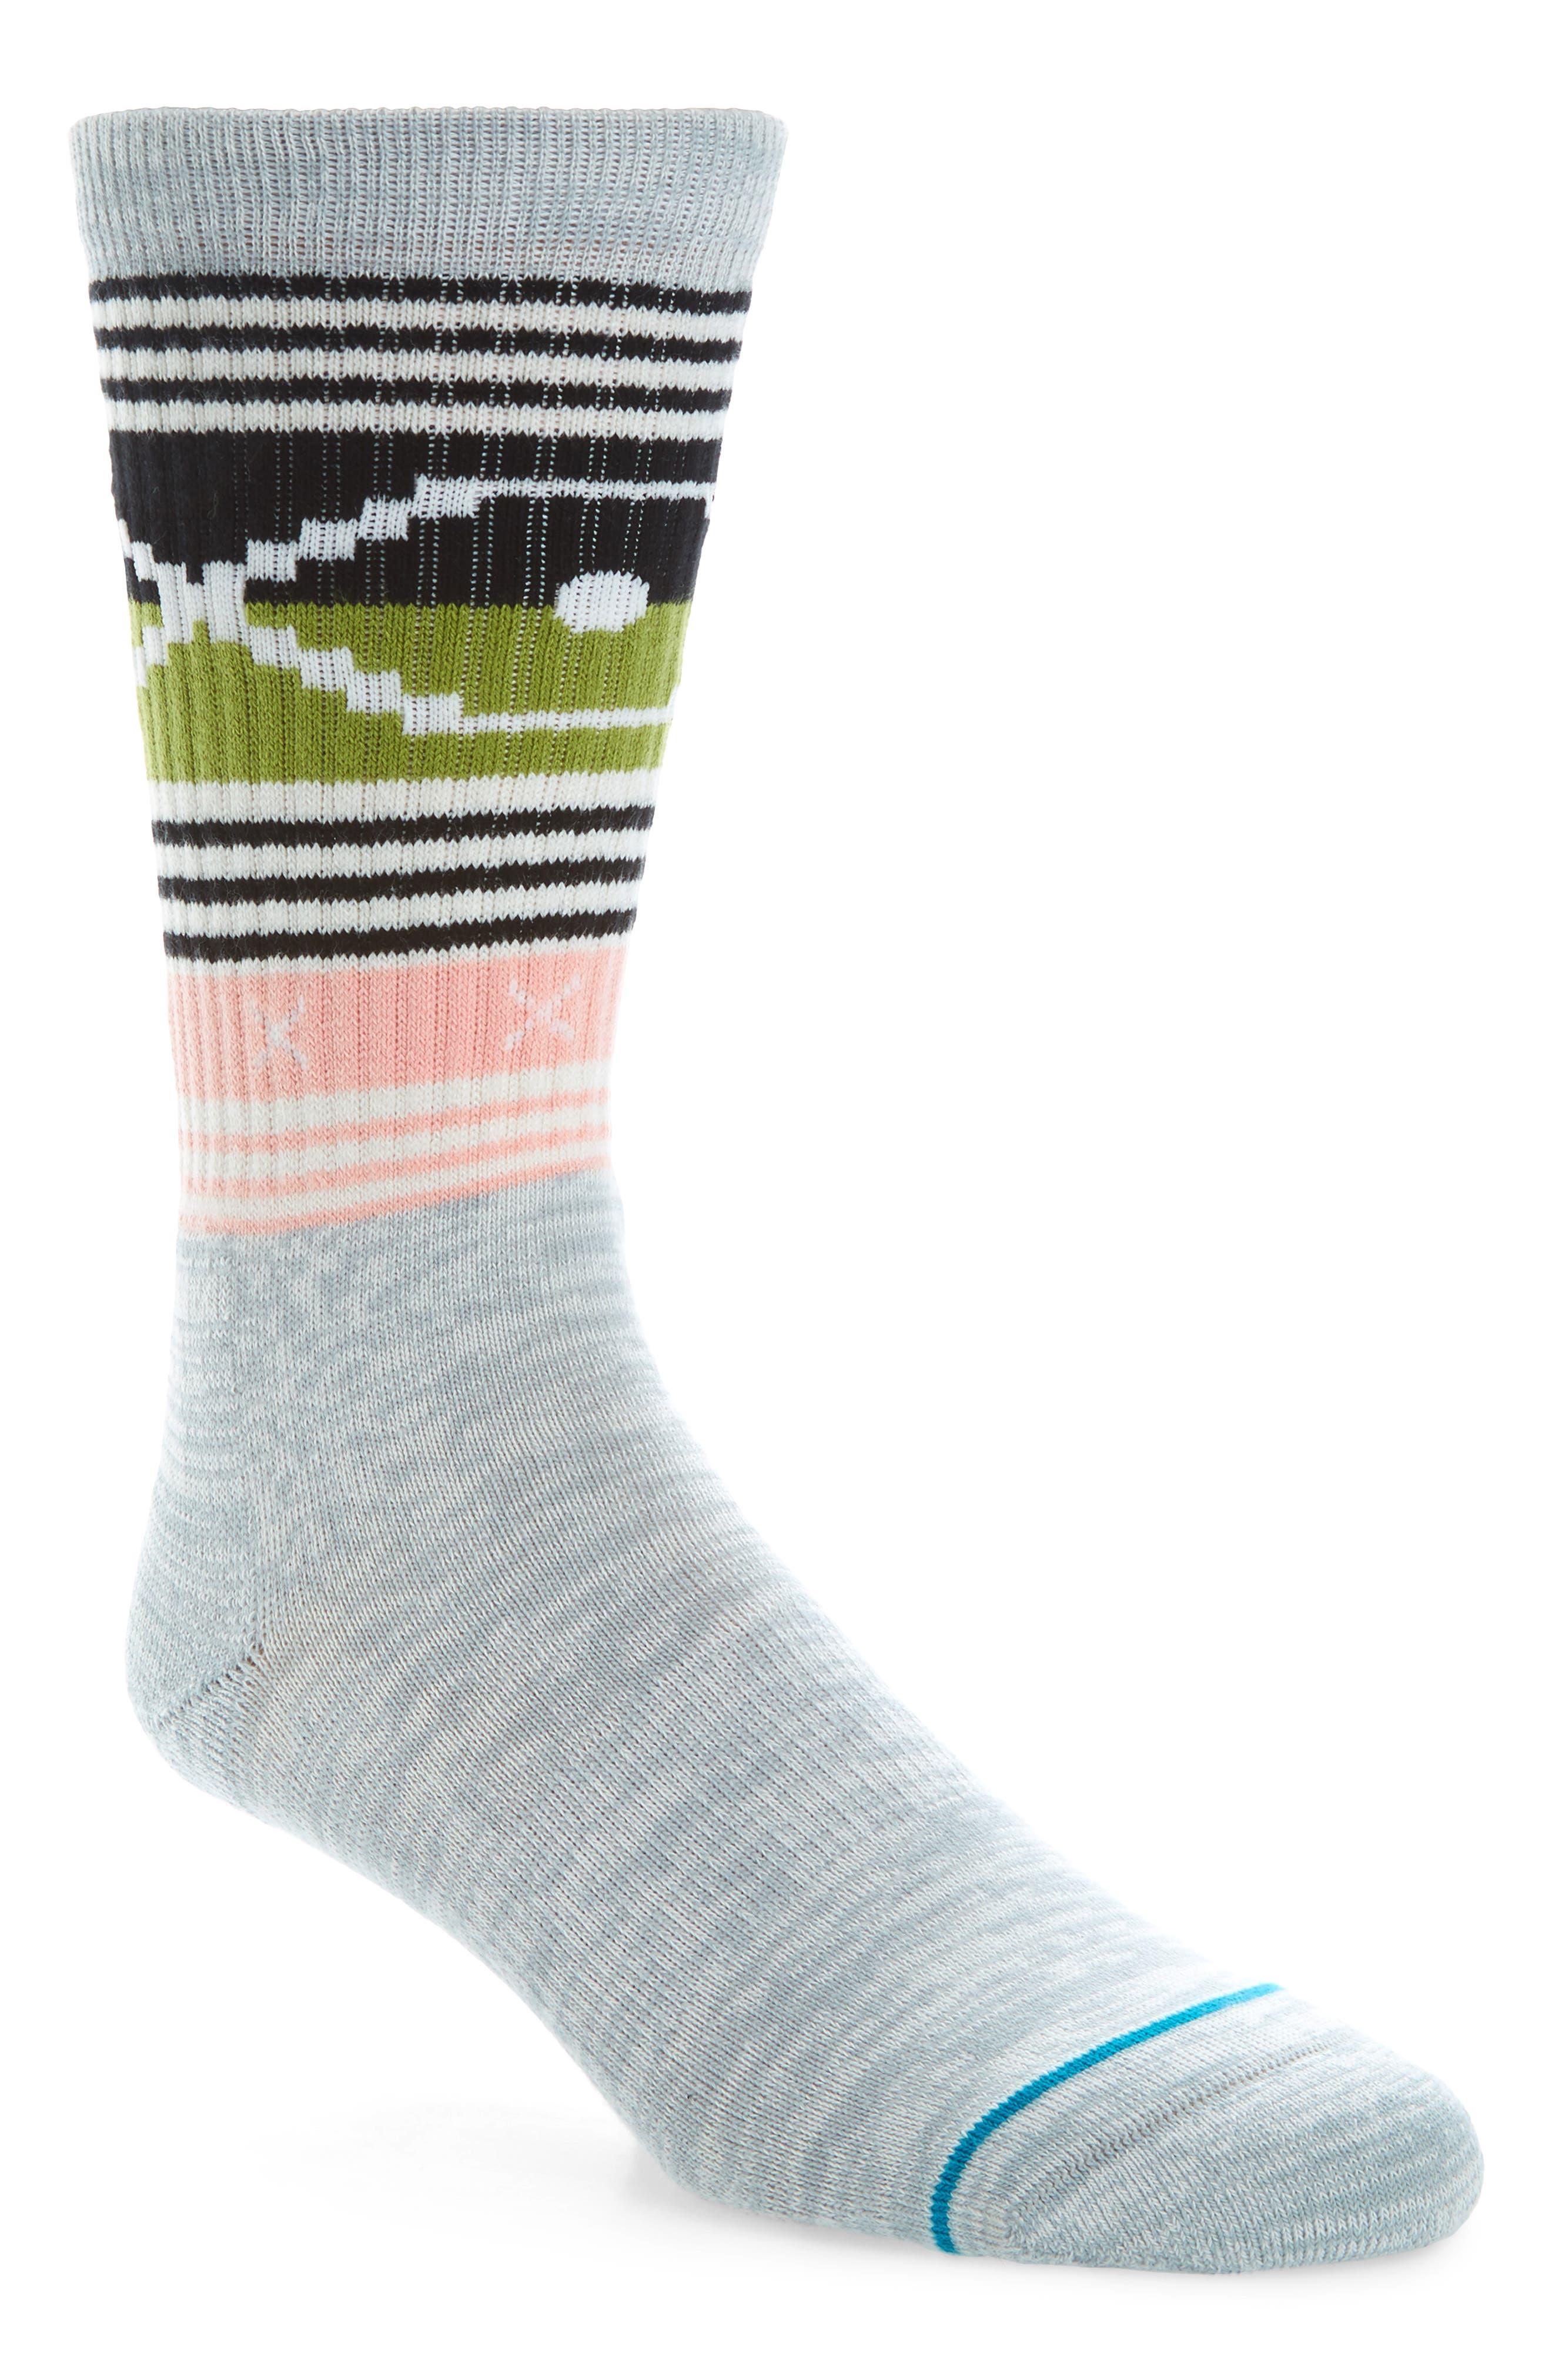 Harries Crew Socks,                         Main,                         color, Grey